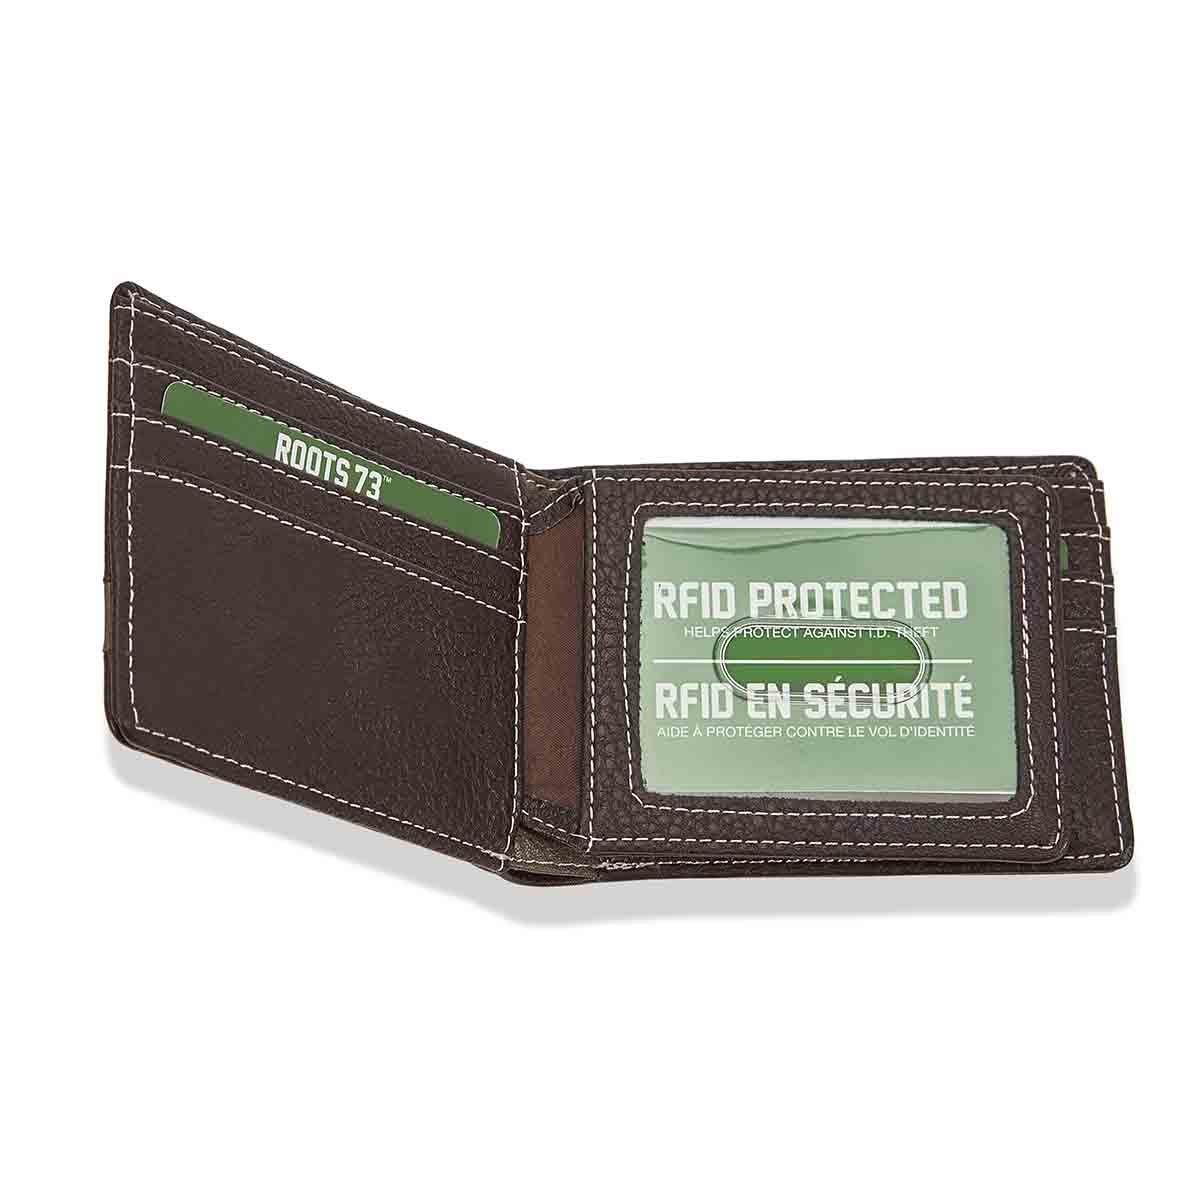 Mns Trail brn cmbo slimfold wallet